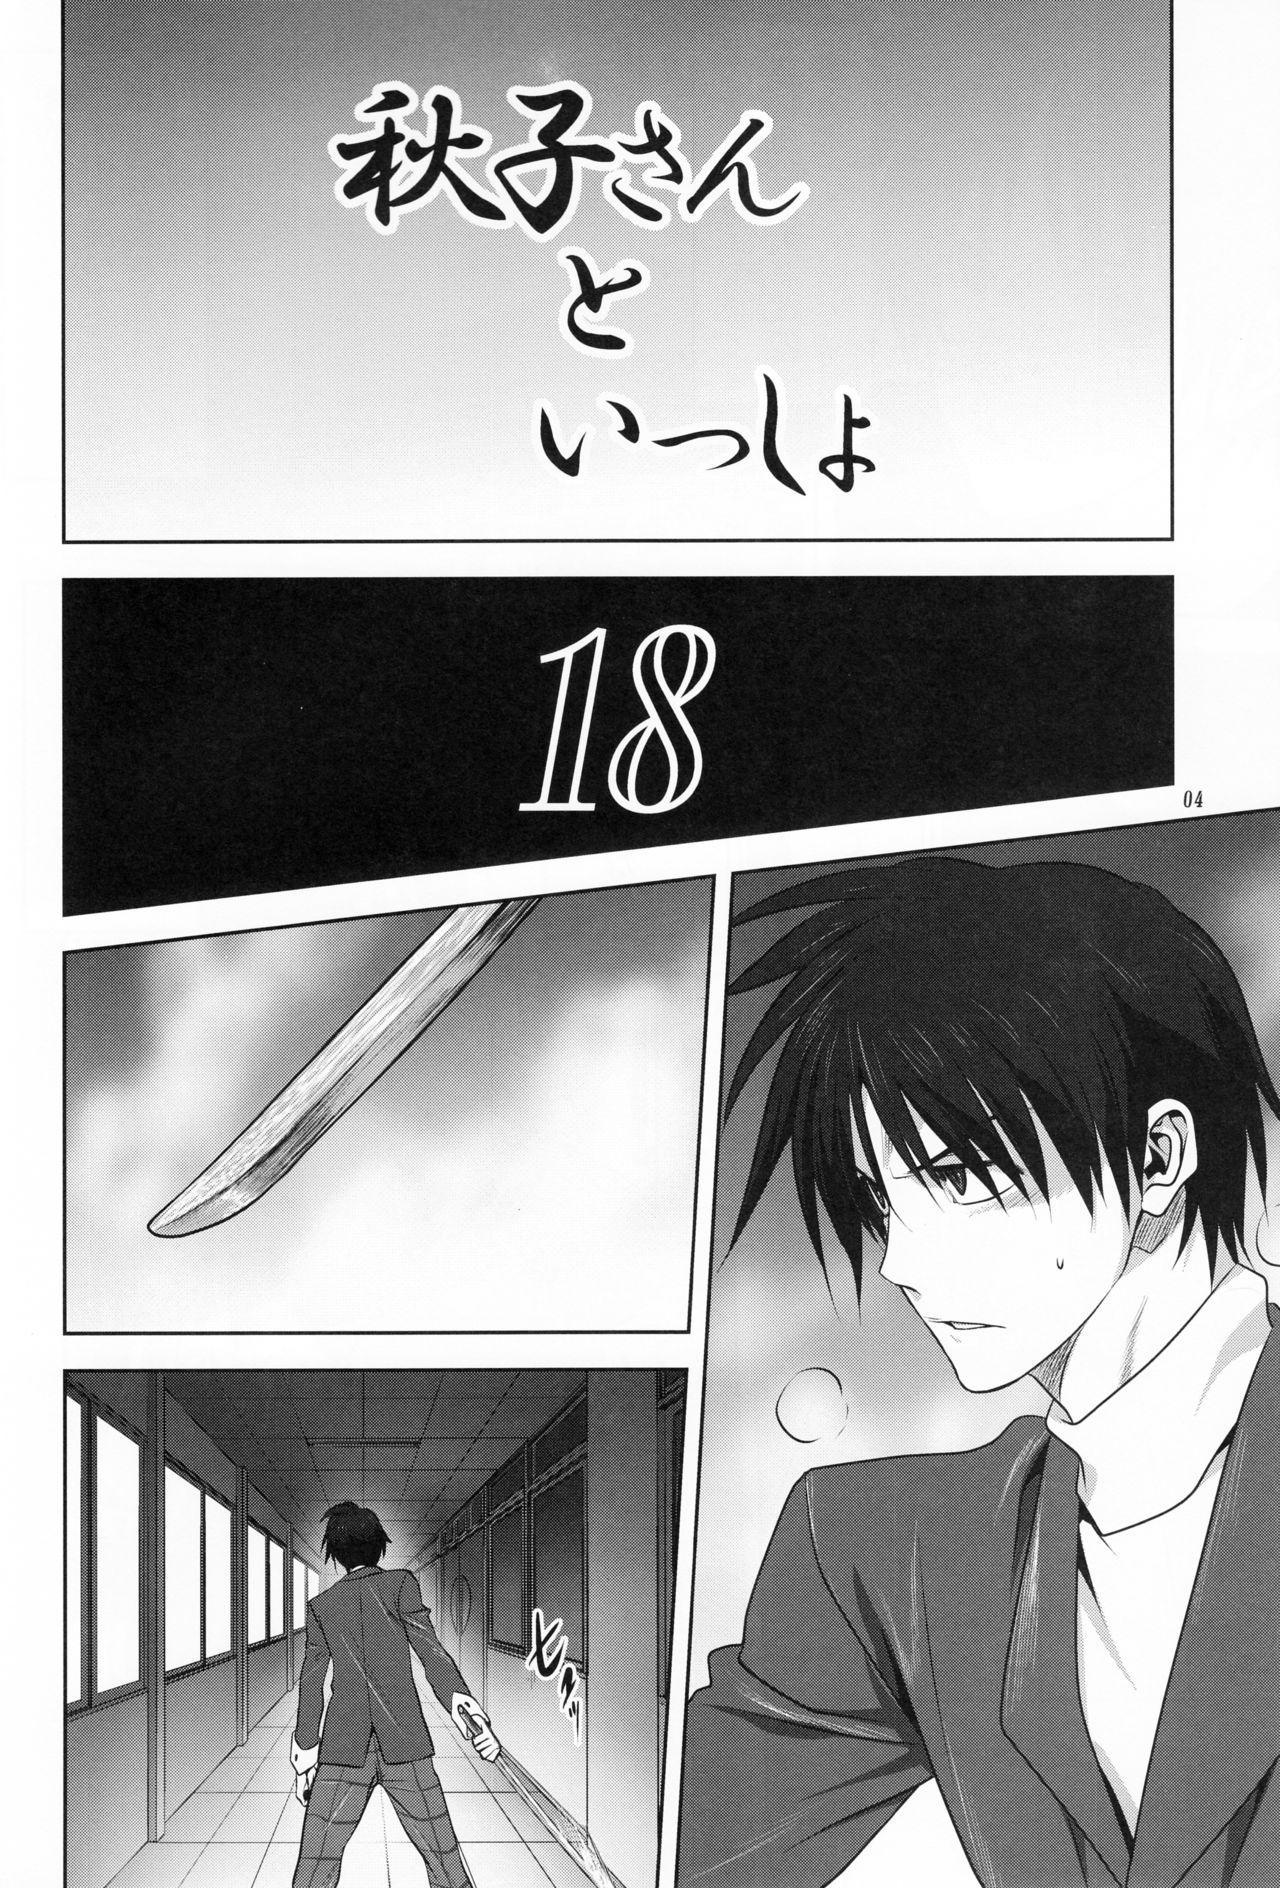 Akiko-san to Issho 18 2